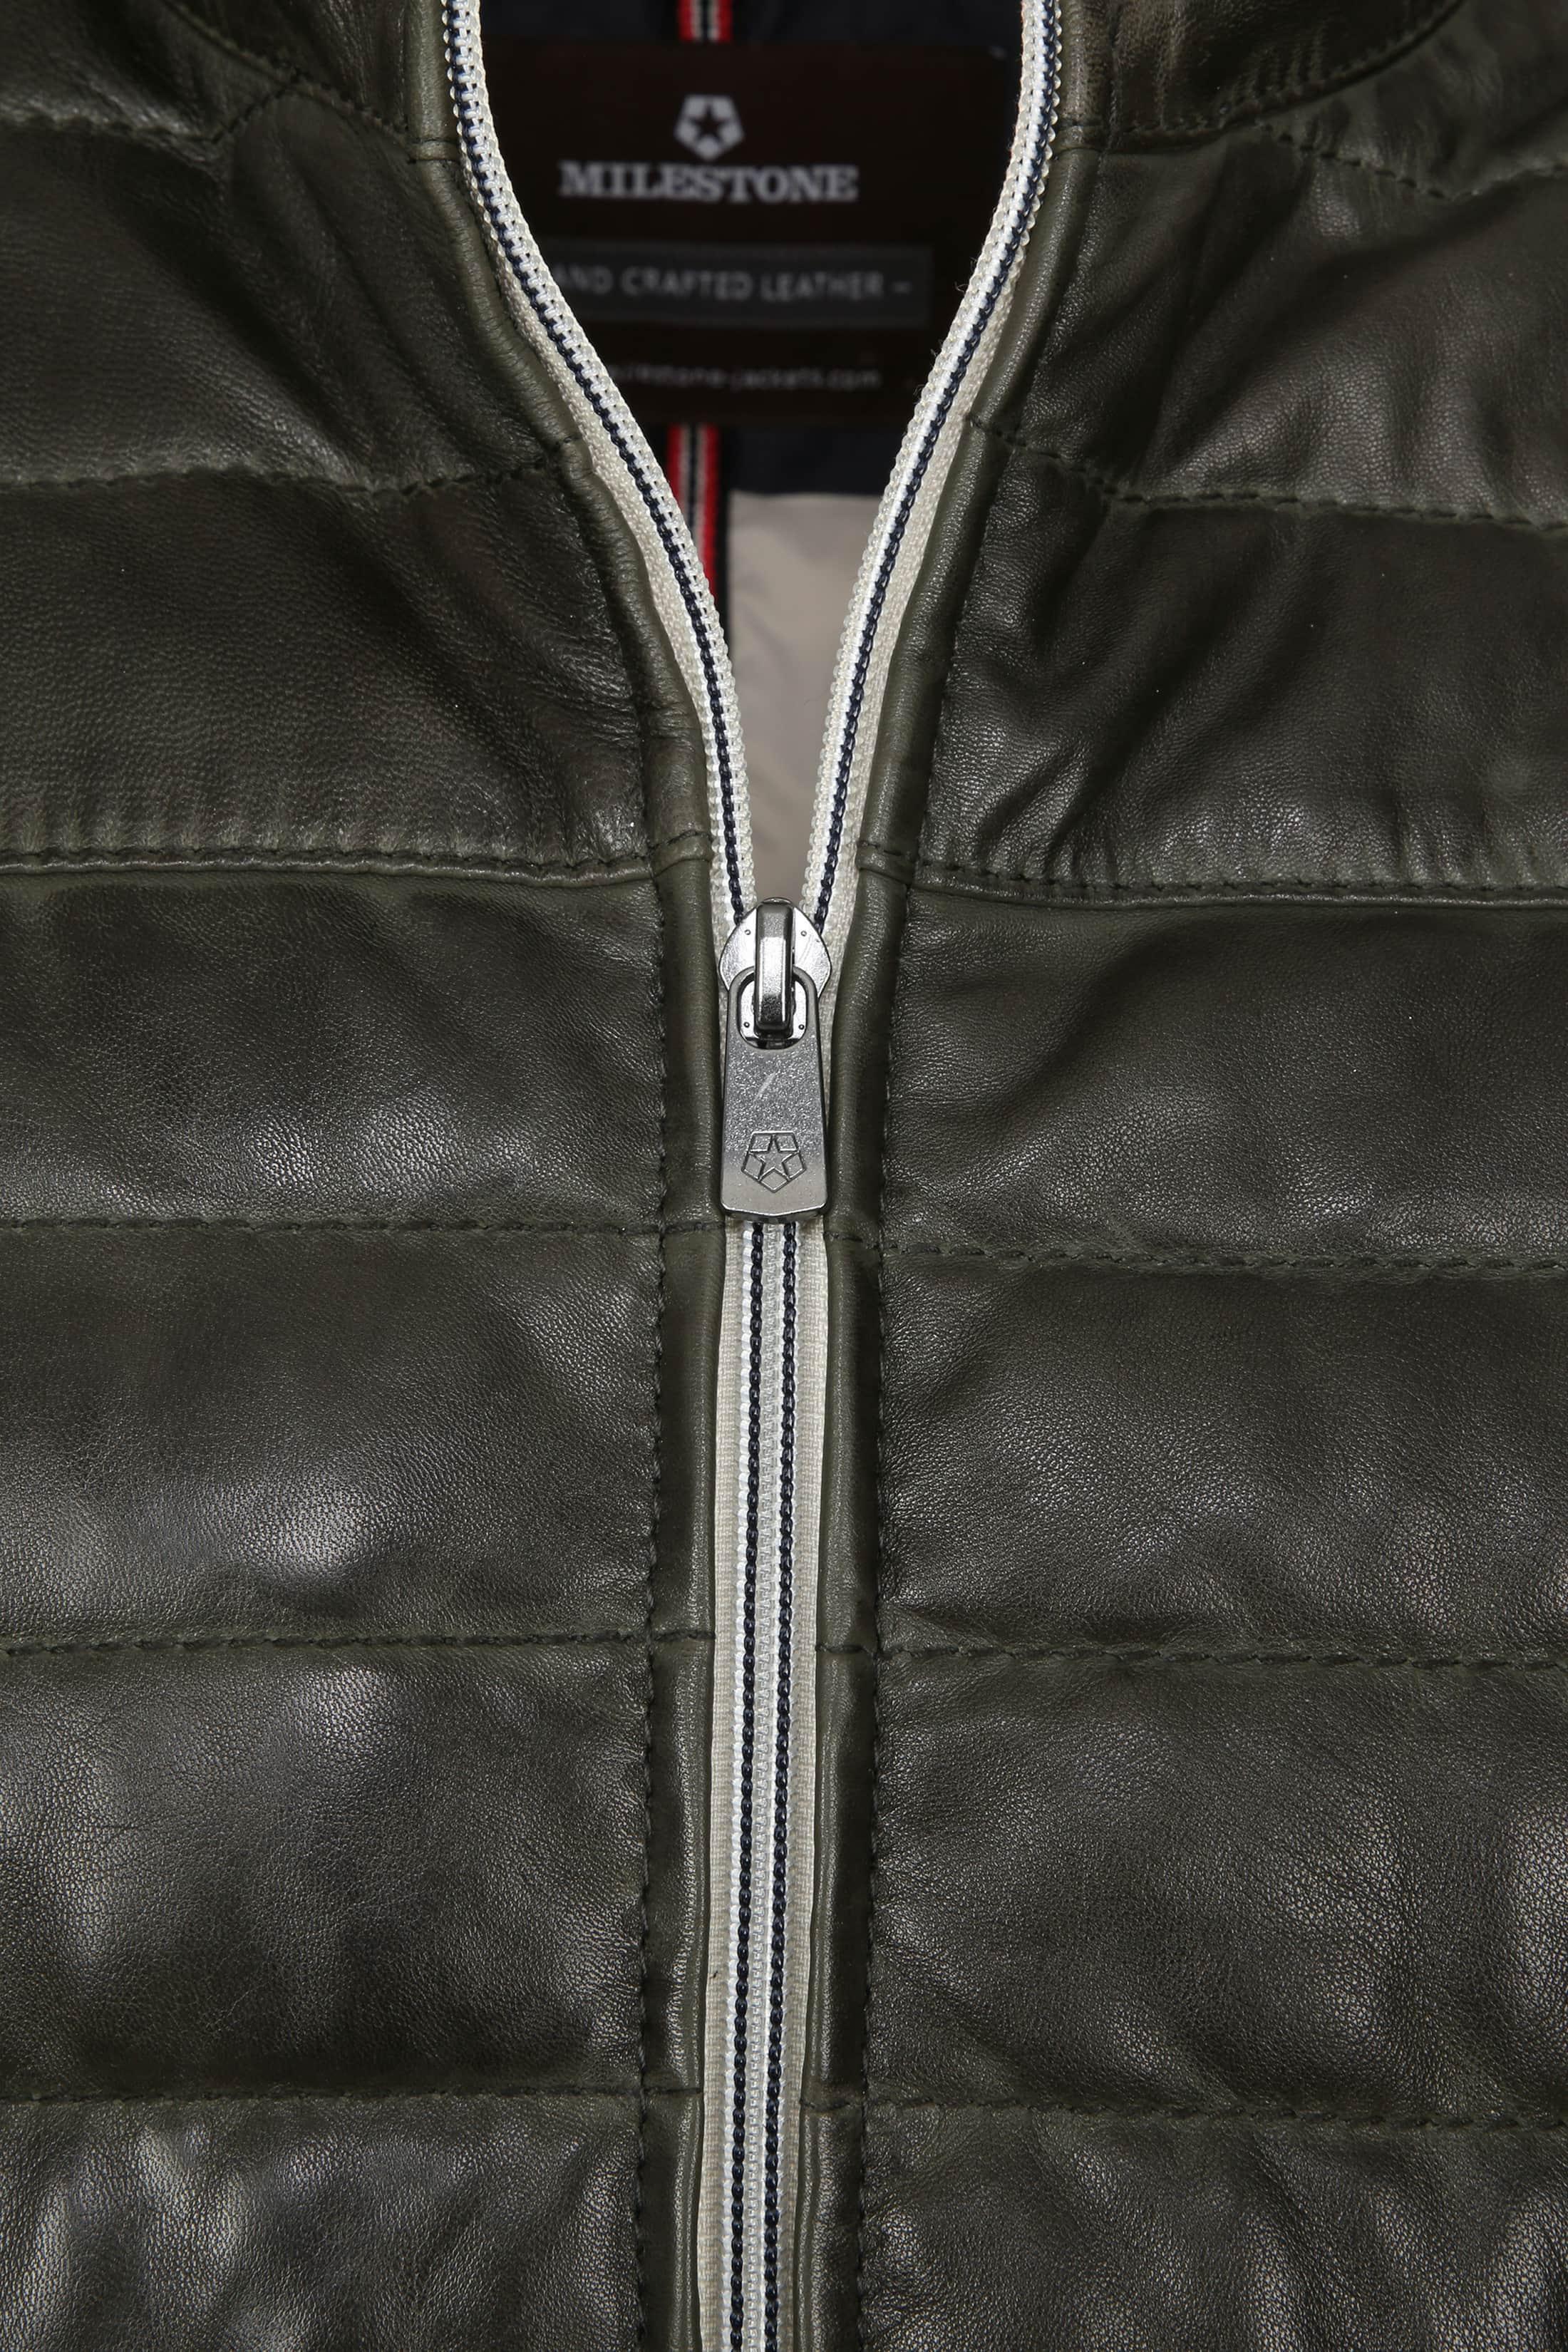 Milestone Tereno Leather Jacket Dark Green foto 3